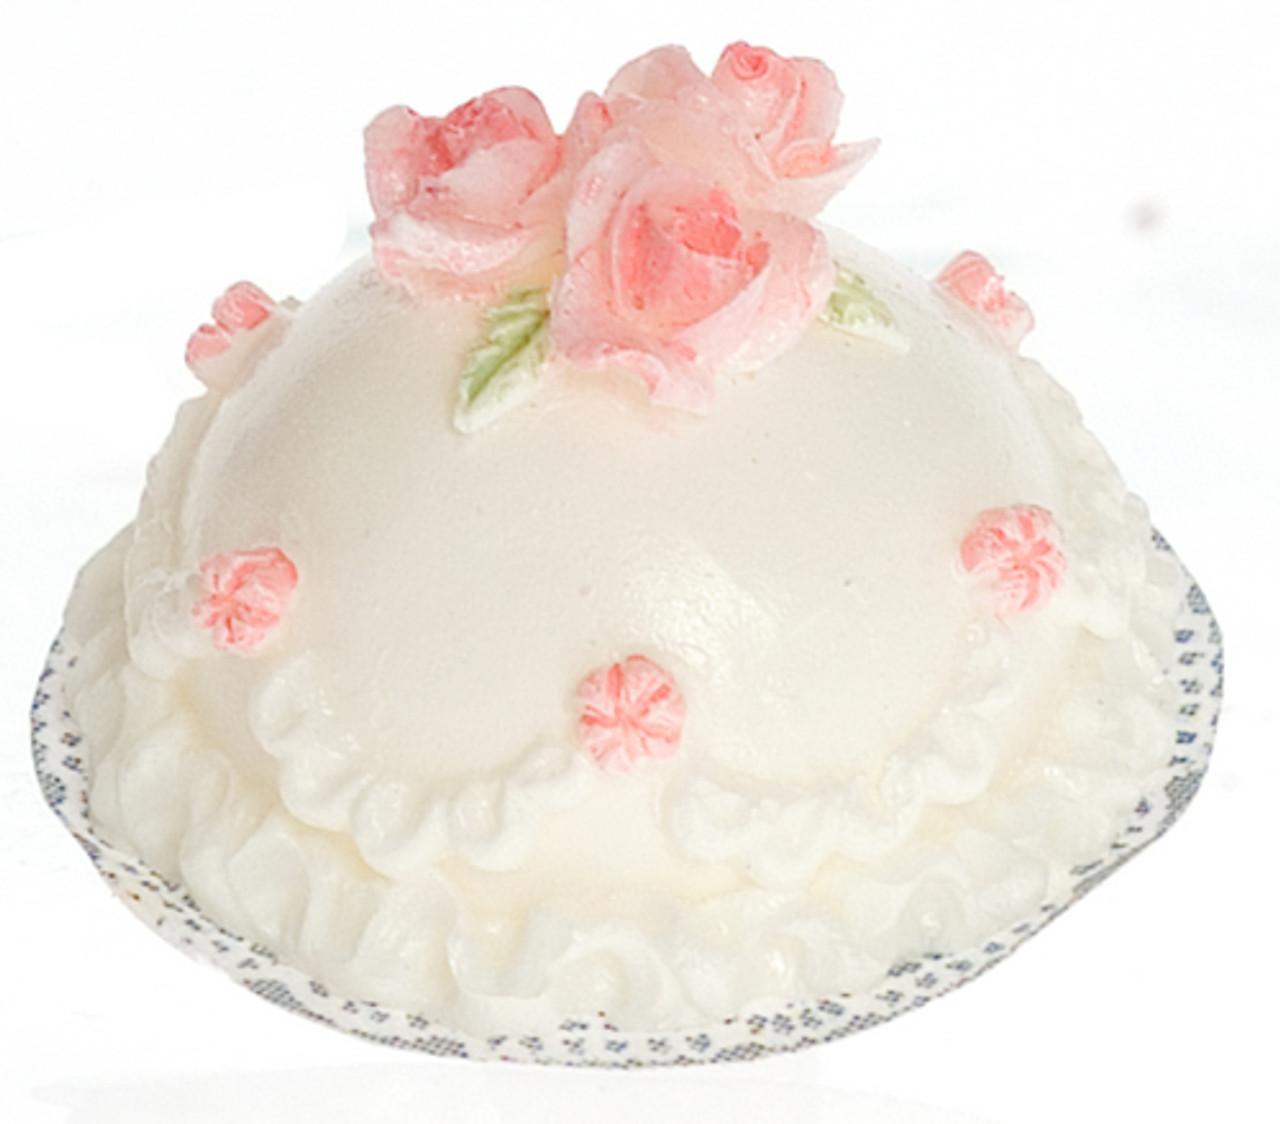 Red Cake with Pink Rose Set